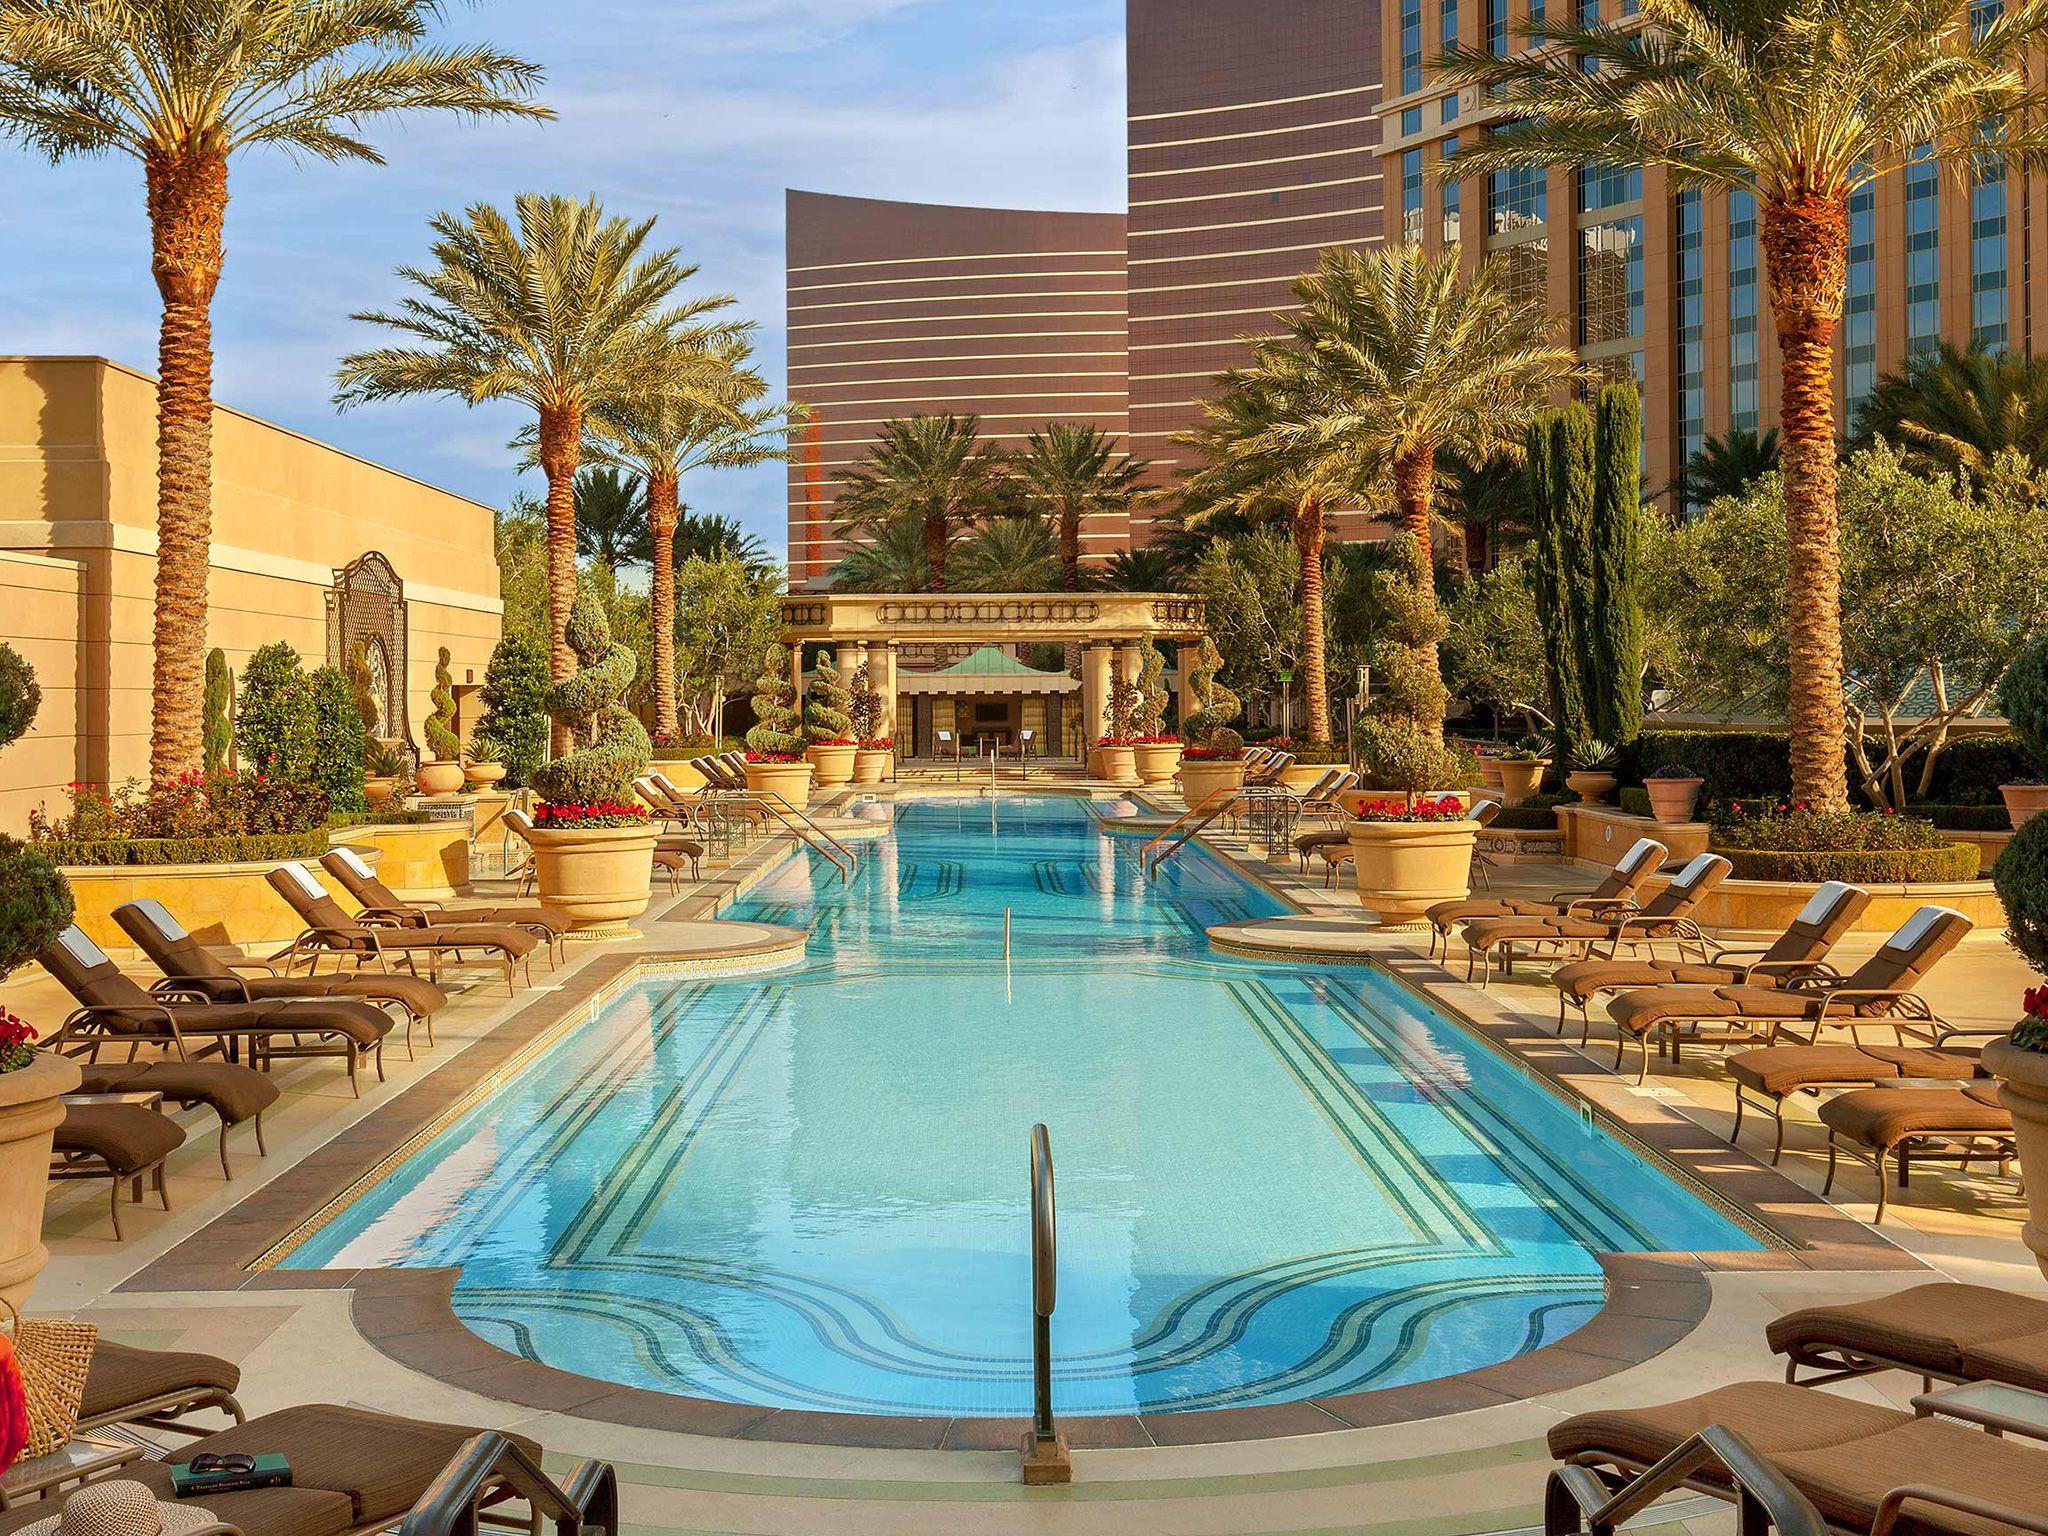 Best Hotels In Las Vegas Readers Choice Awards 2017 Condé Nast Traveler